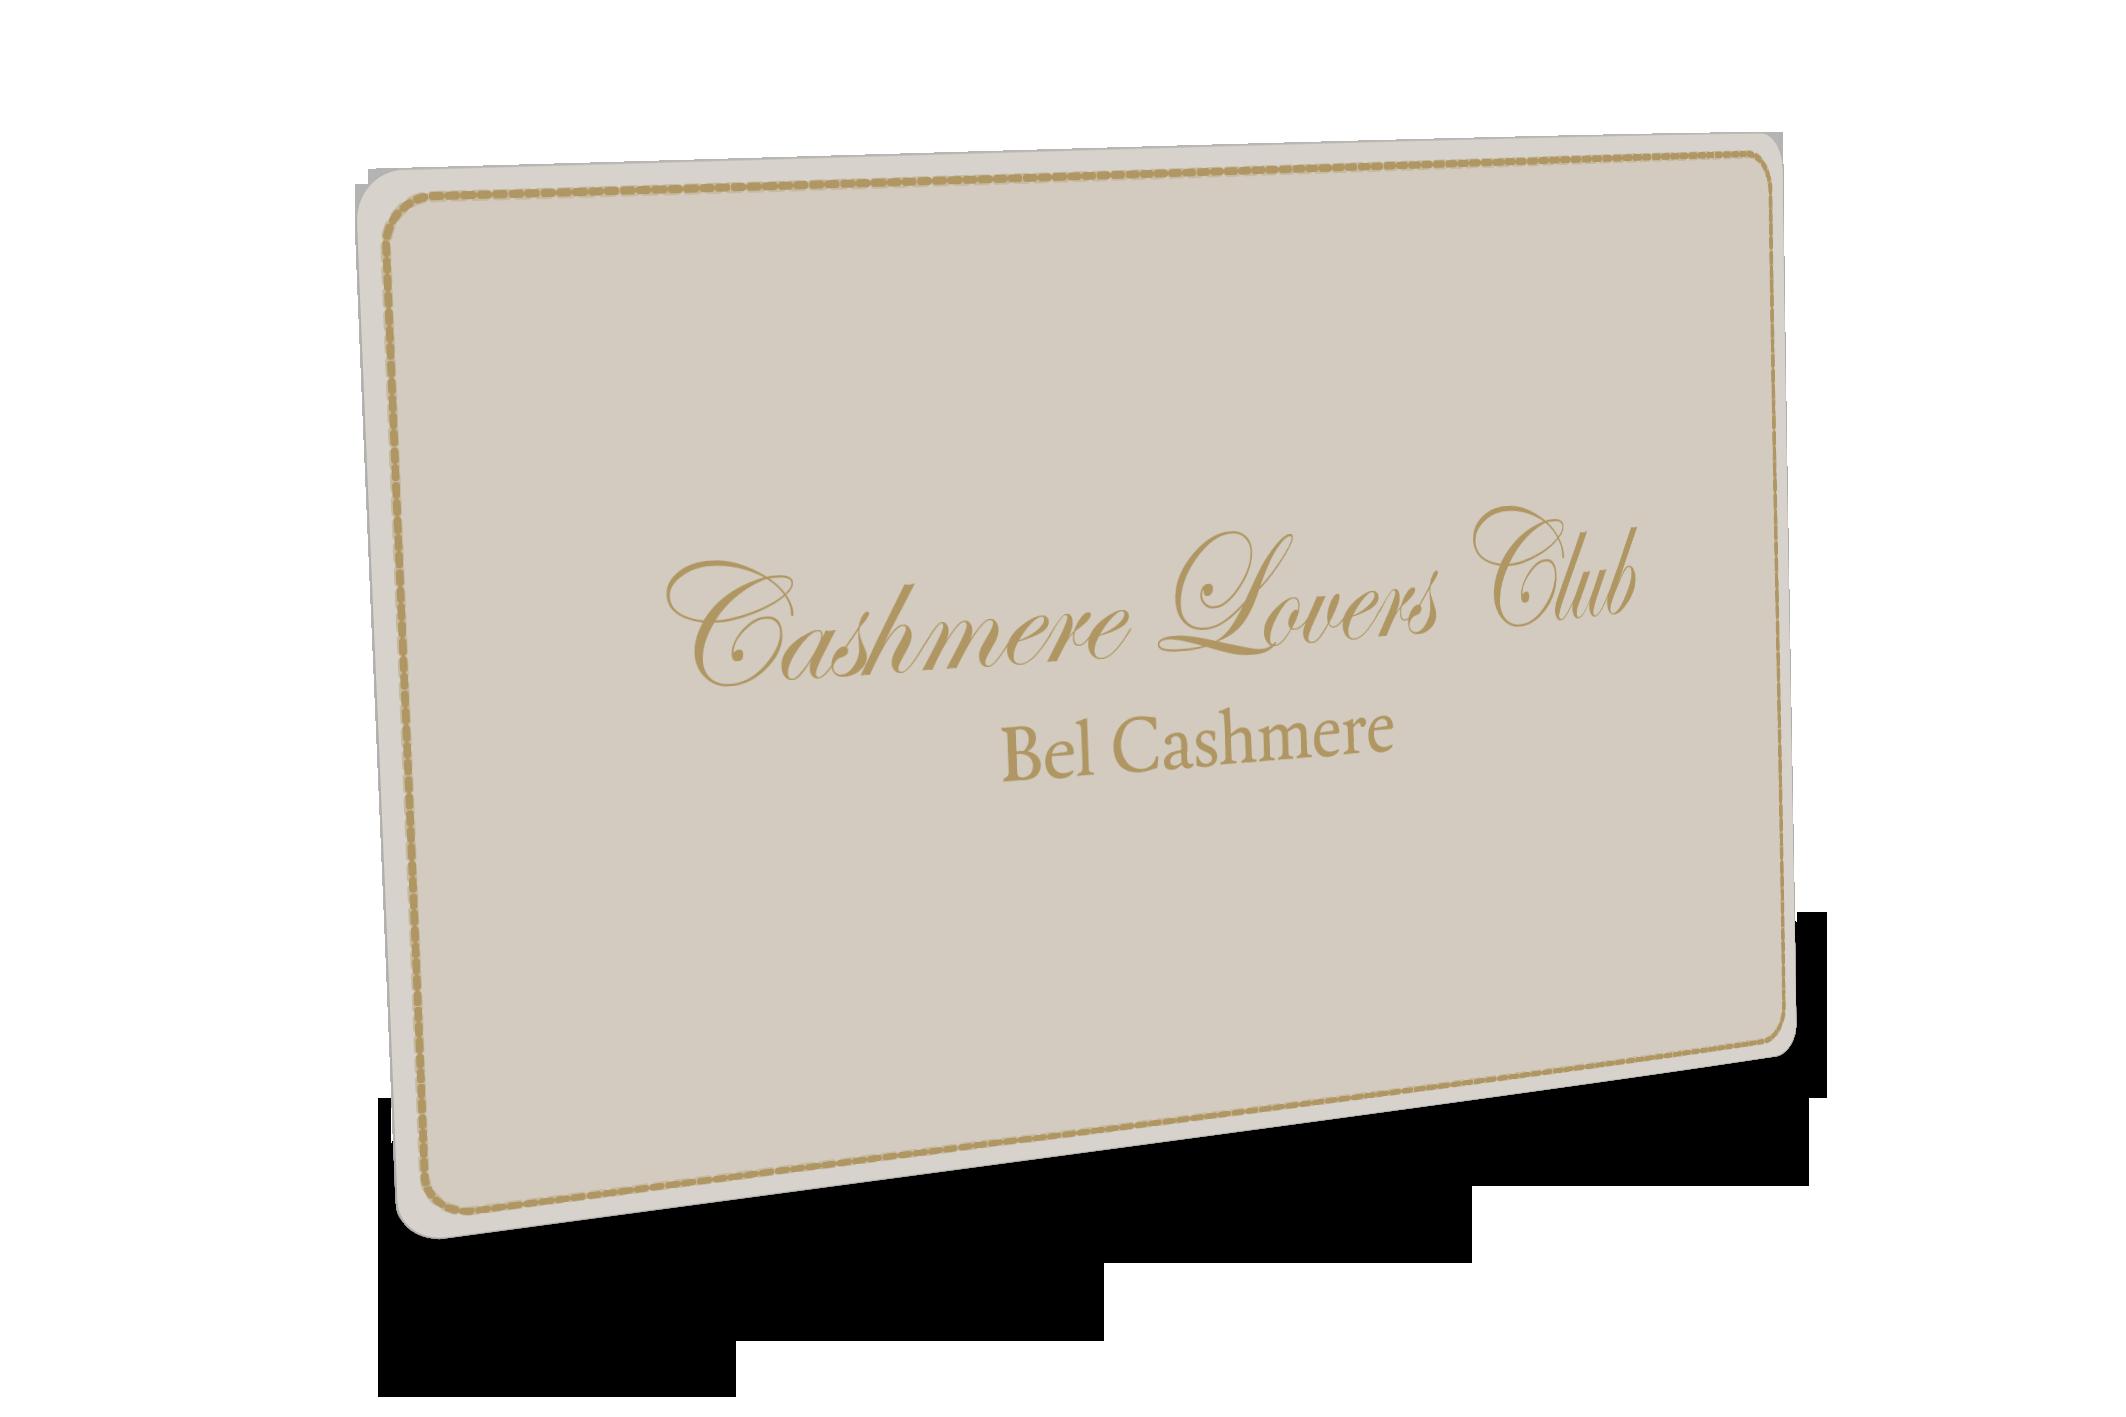 Cuidado del cashmere   Bel cashmere